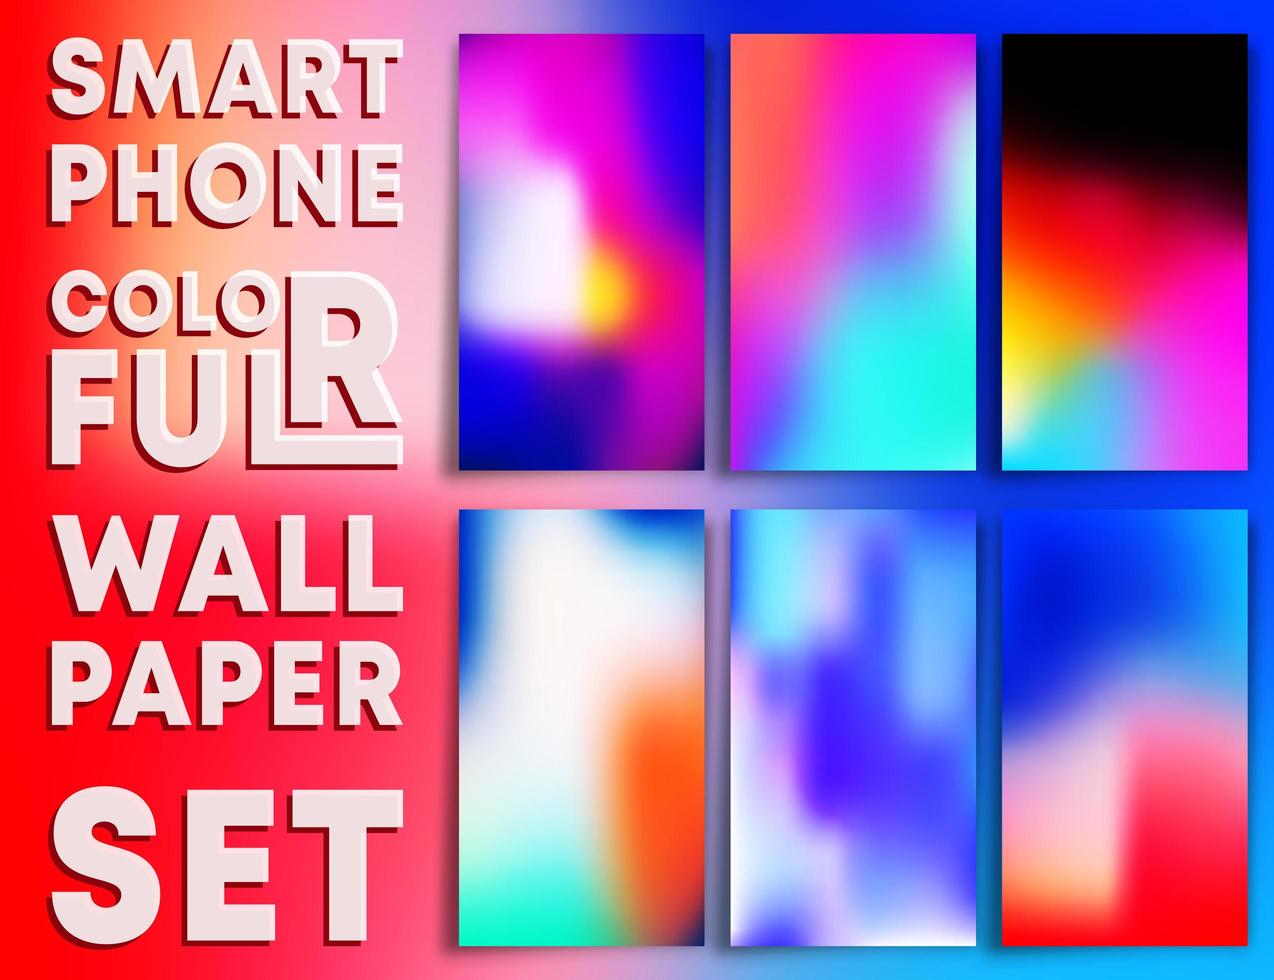 Plantillas de papel tapiz de textura degradada colorida para teléfonos inteligentes vector